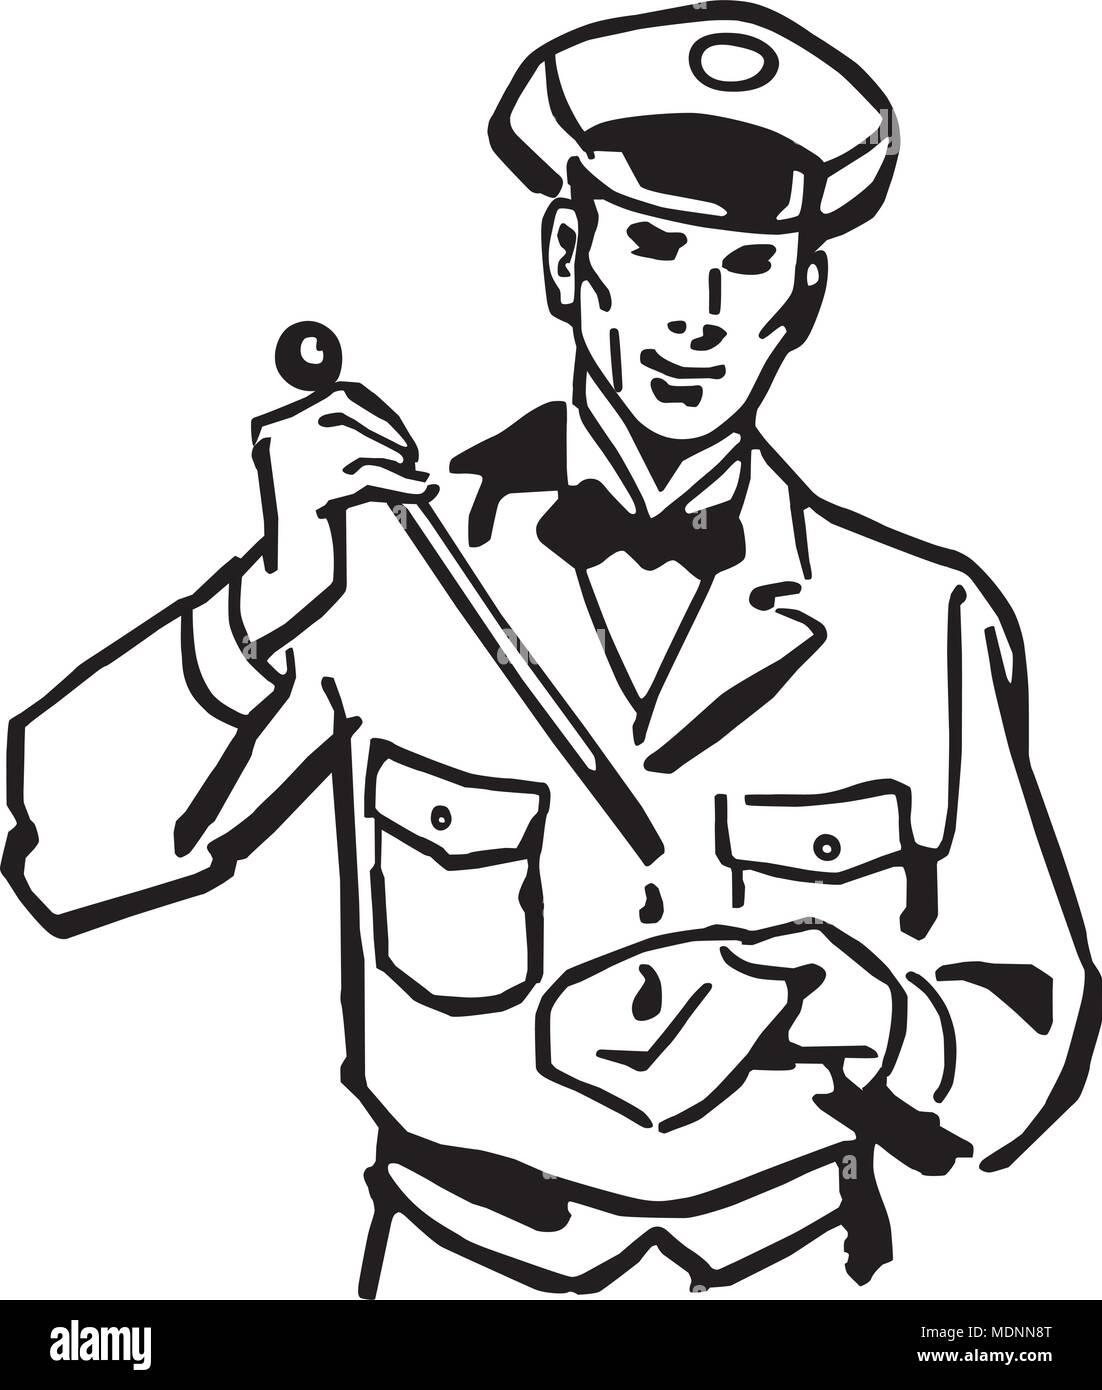 Checking The Oil - Retro Clipart Illustration - Stock Vector